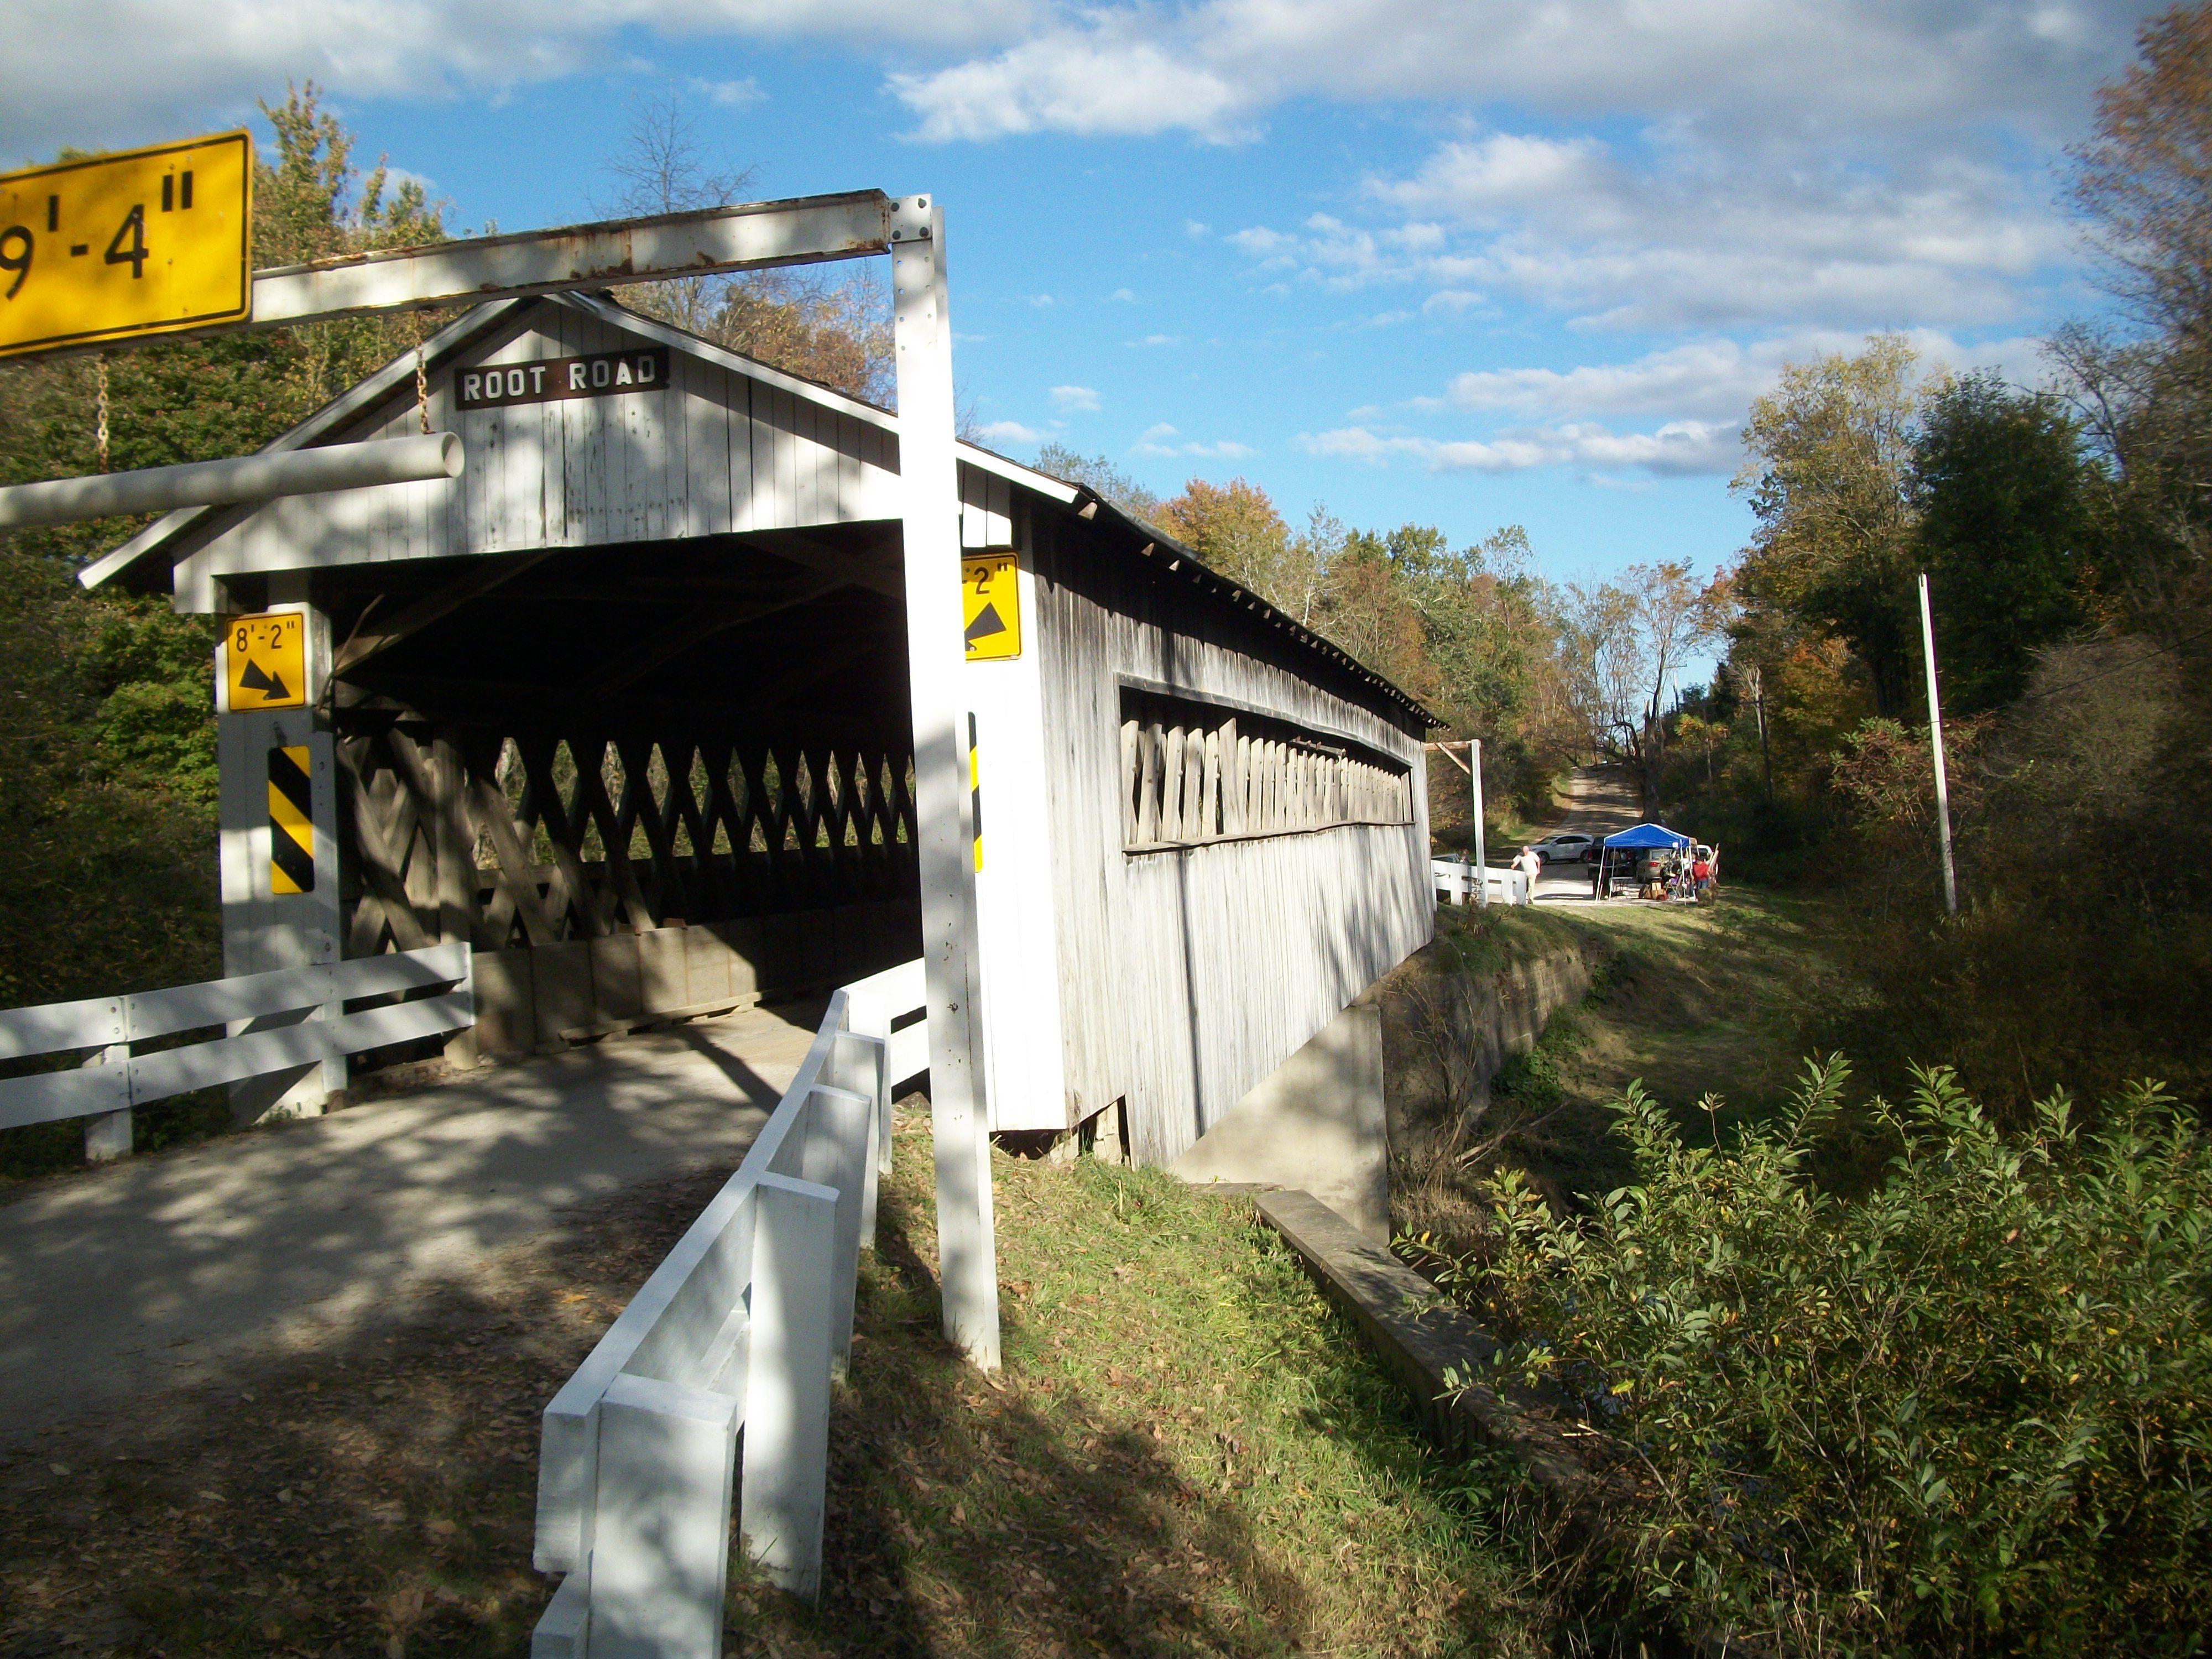 Ohio - Ashtabula County Covered Bridge Festival 2013 - The Root Rd. Bridge spans over the Ashtabula River